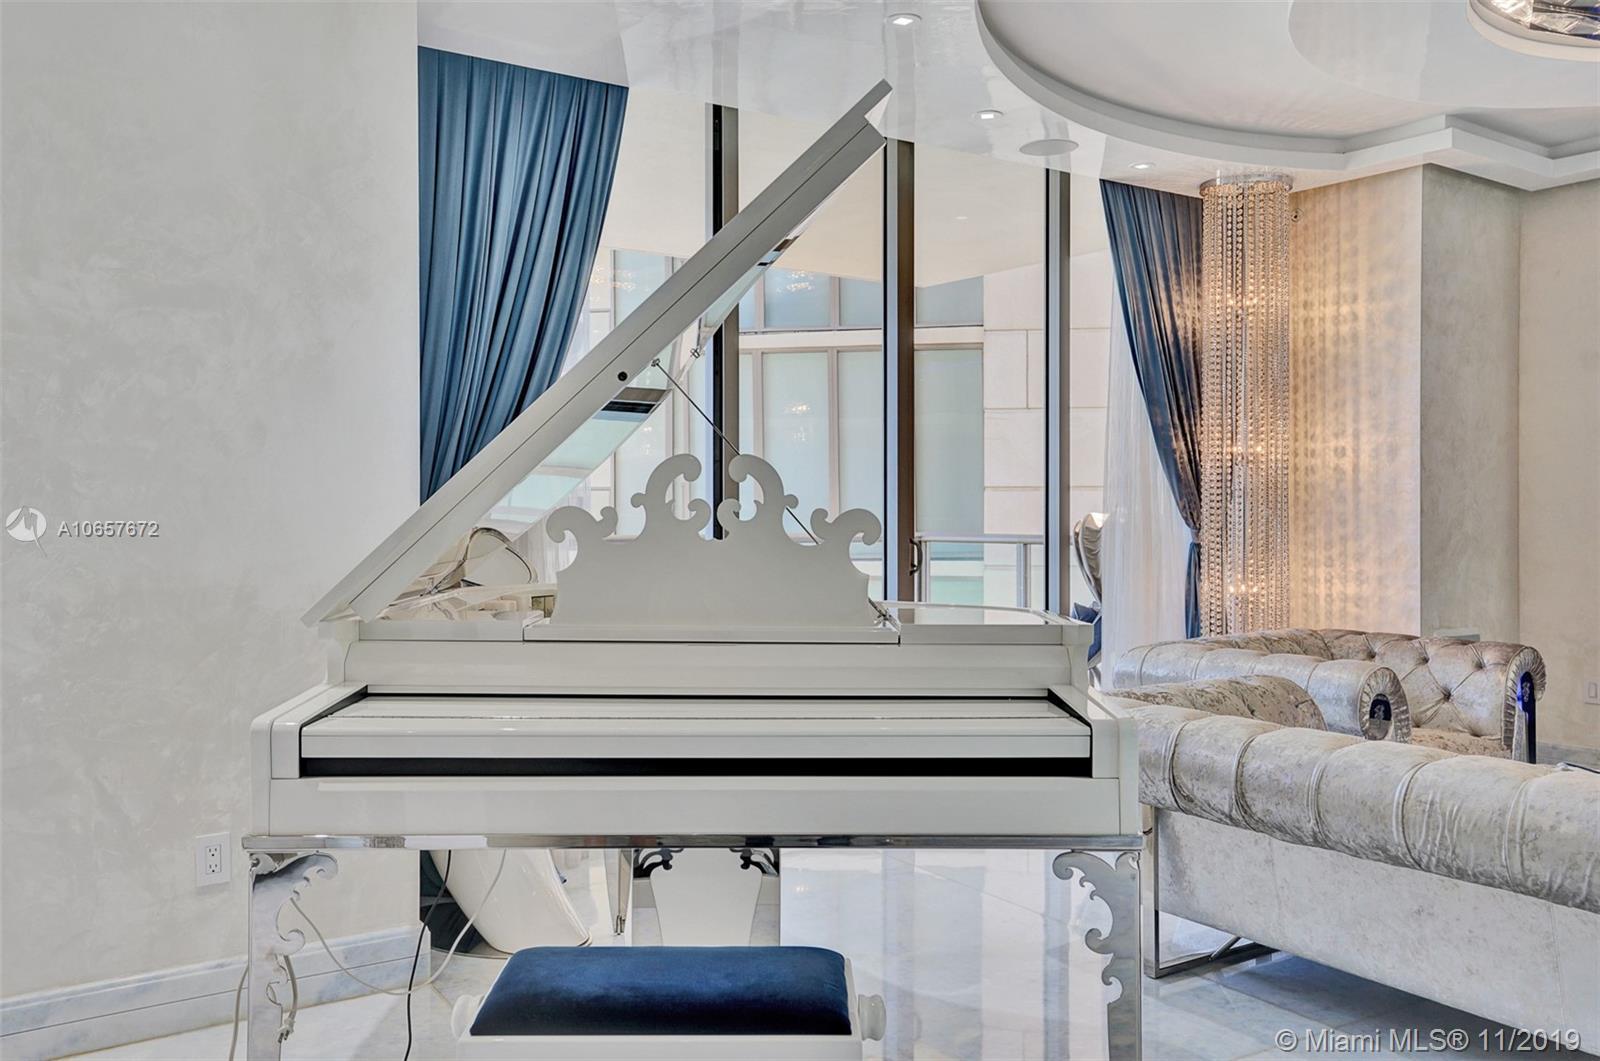 Аренда квартиры по адресу 9705 Collins Ave, Bal Harbour, FL 33154 в США